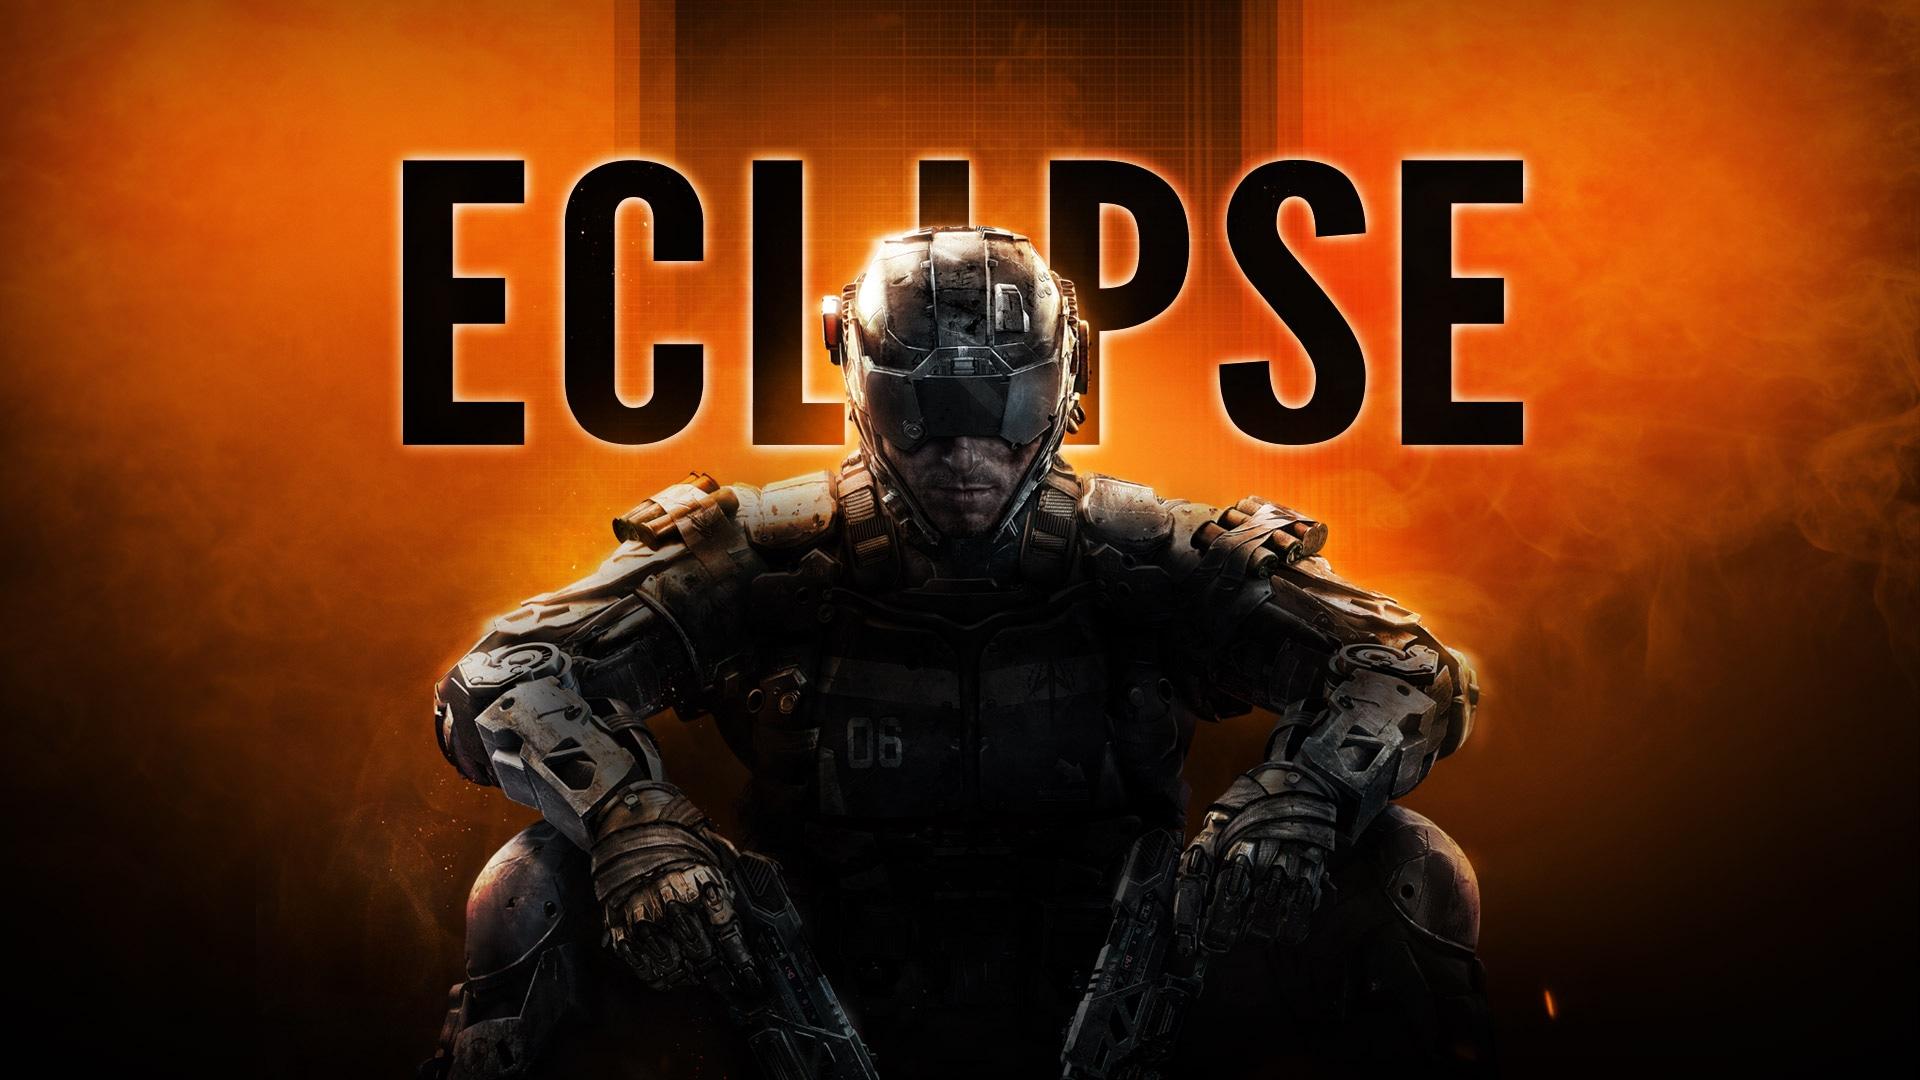 Call of Duty: Black Ops 3 - DLC-Trailer zu neuer Zombie-Map ...